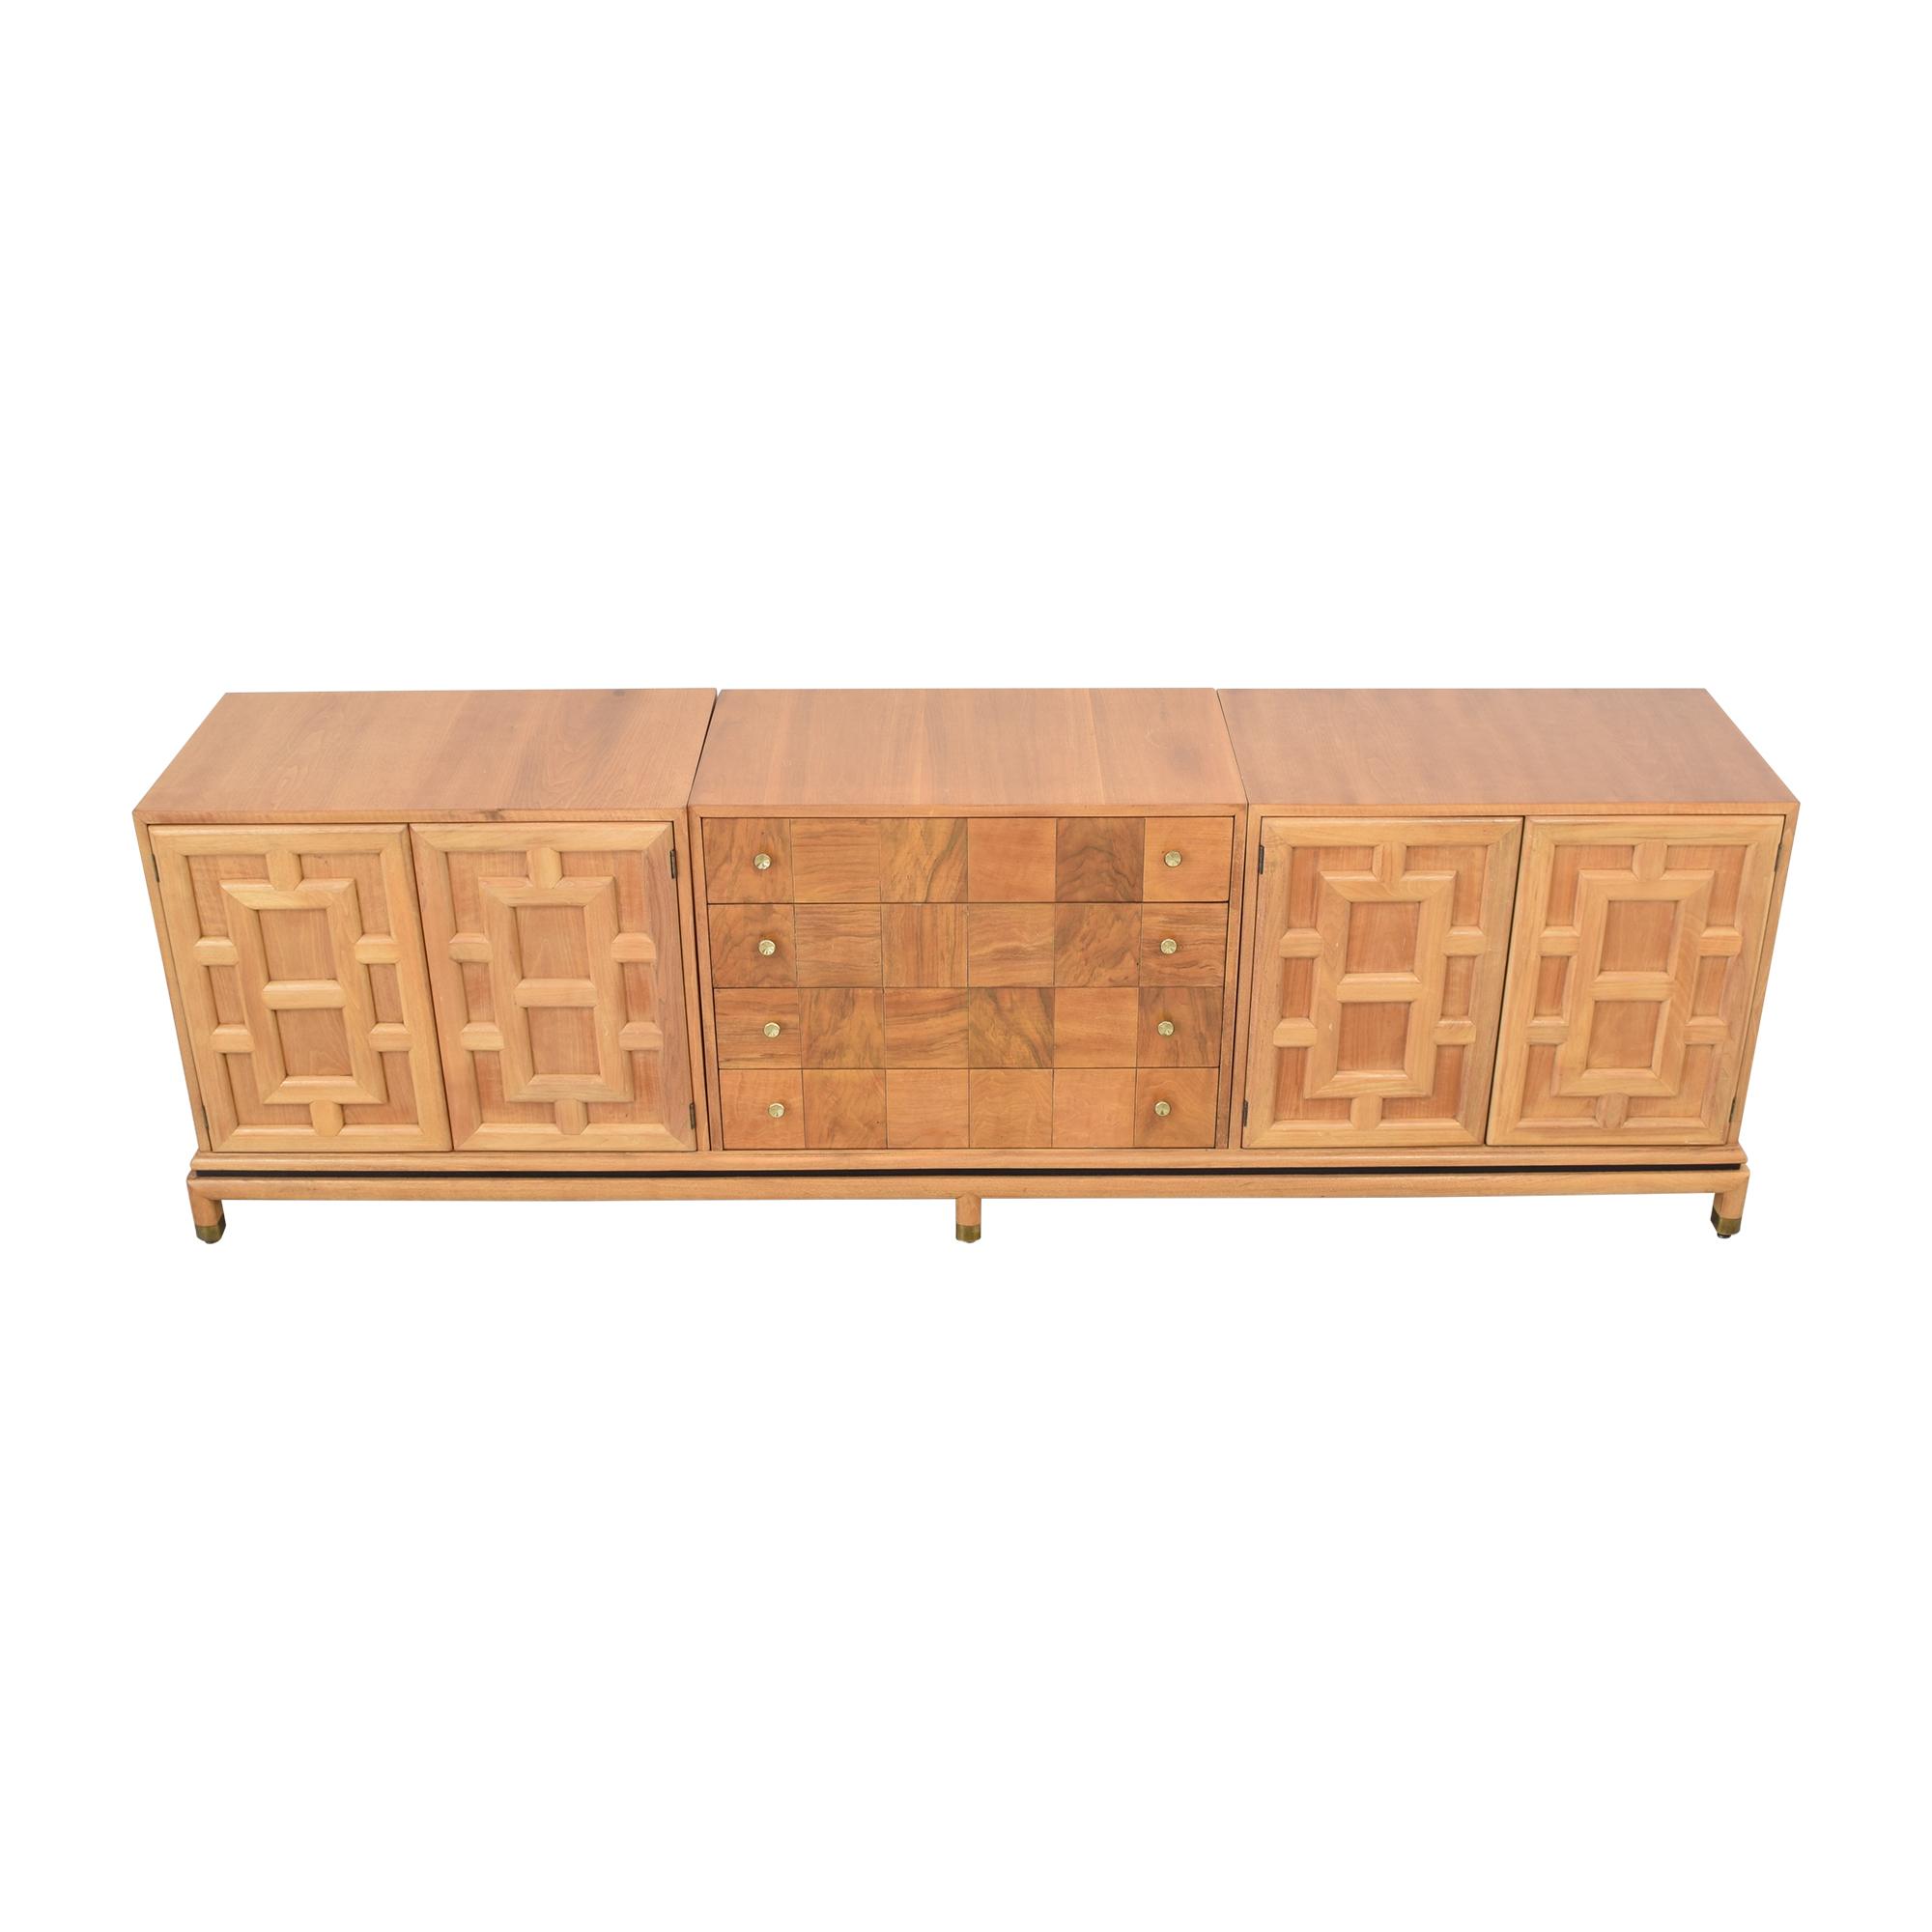 Johnson Furniture Johnson Furniture Geometric Sideboard used